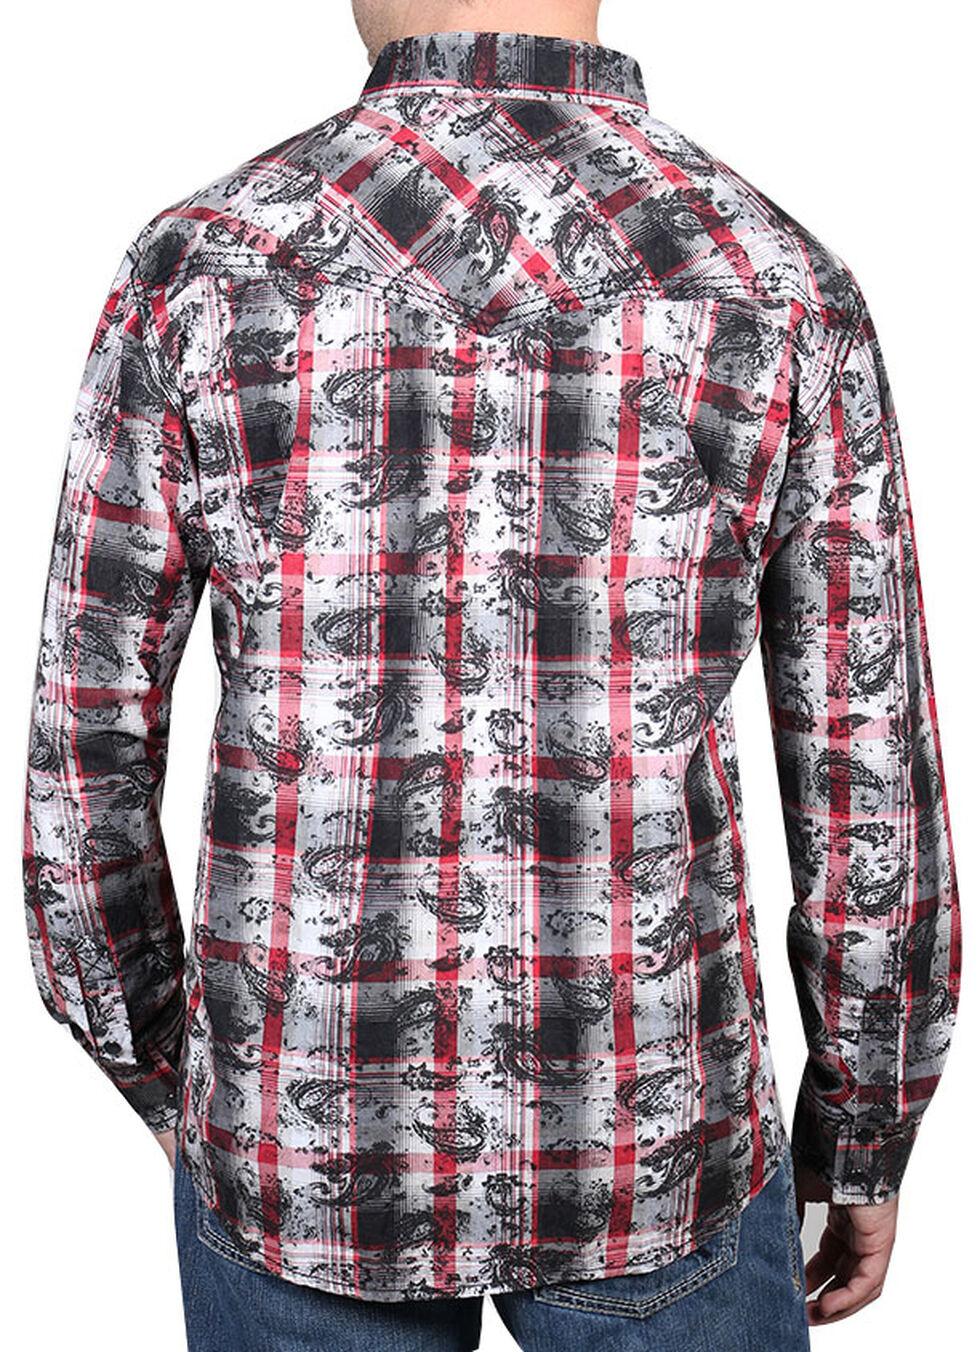 Moonshine Spirit Men's Spanish Trail Paisley Long Sleeve Shirt, Black, hi-res